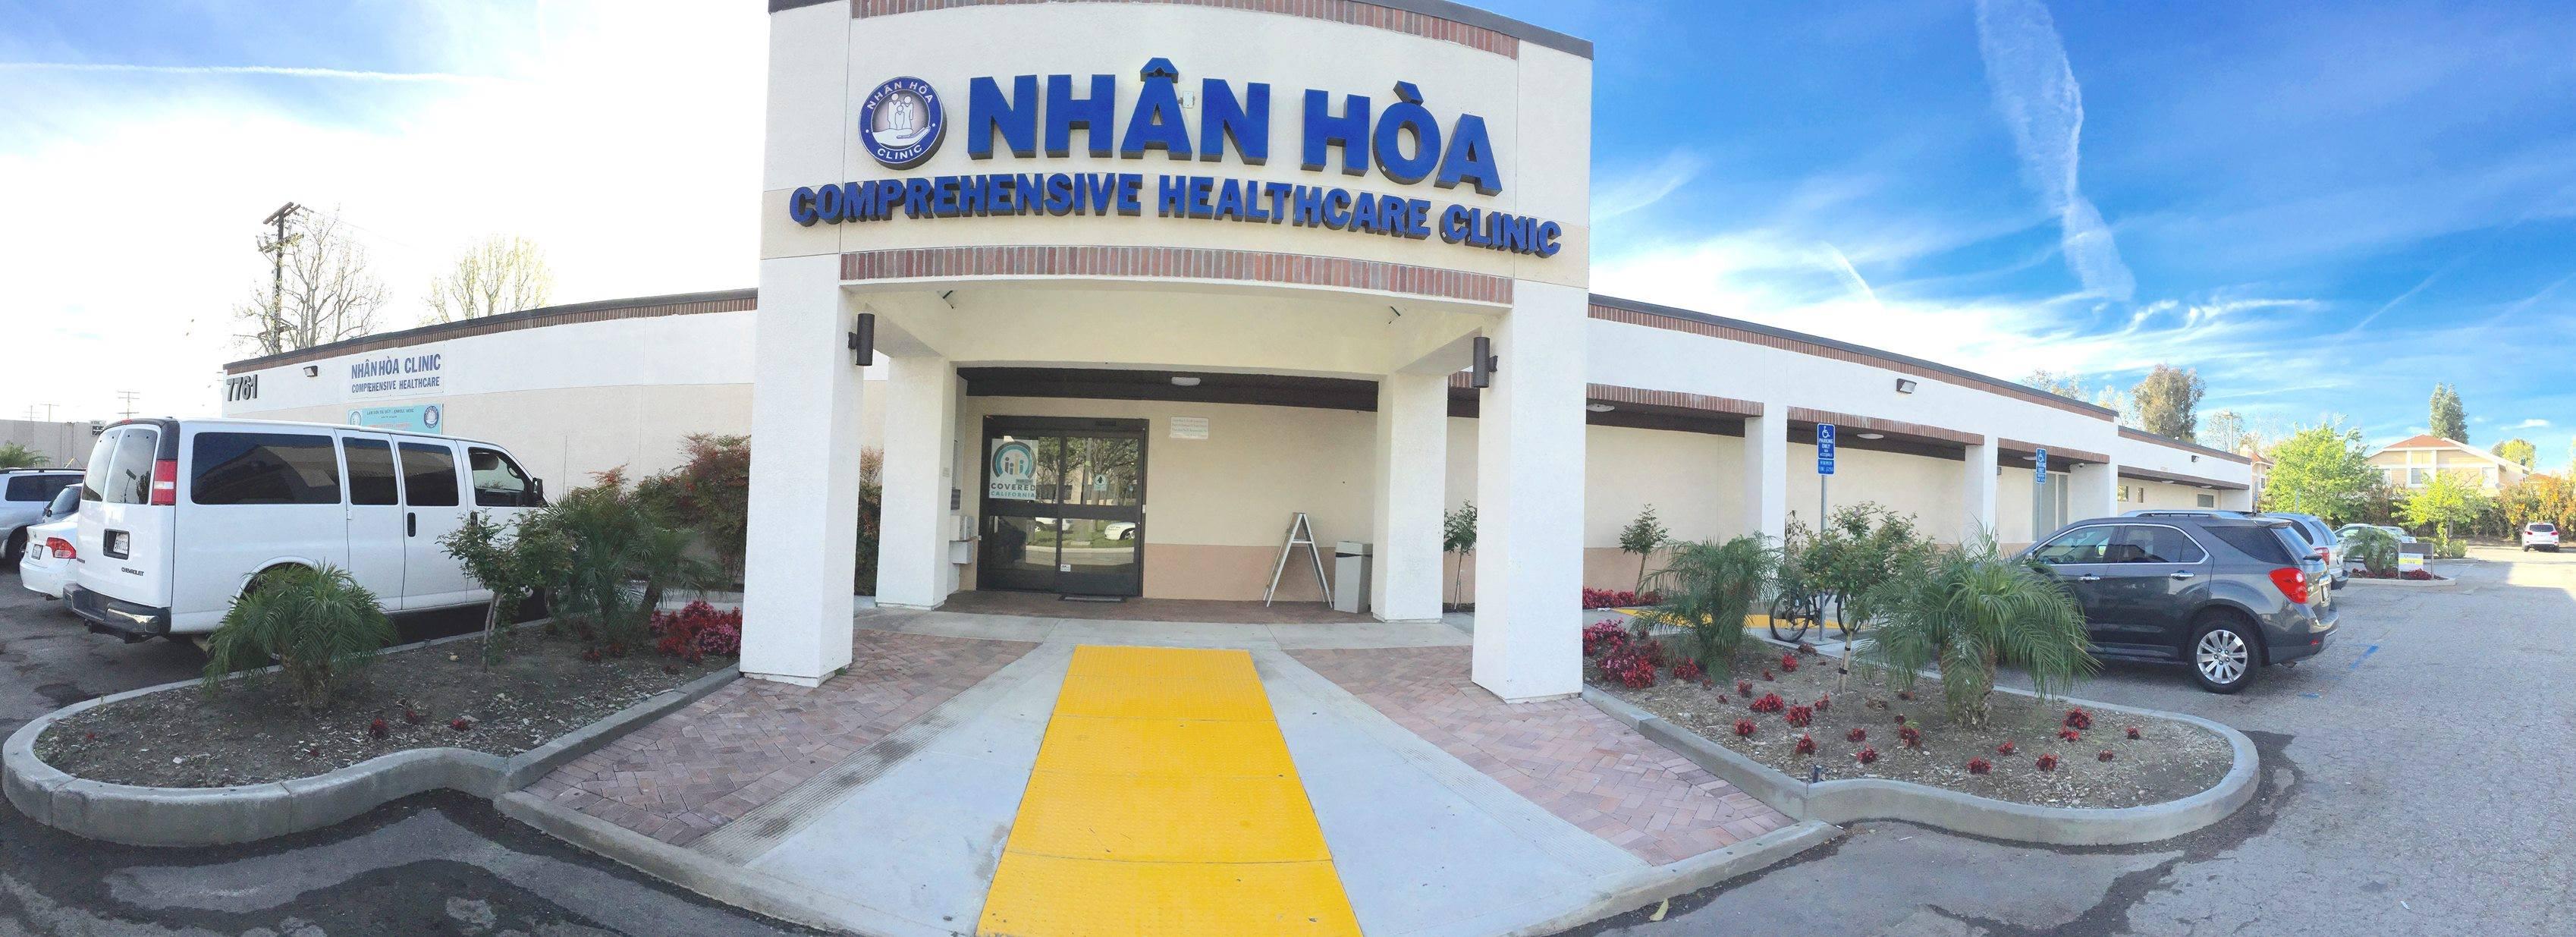 Nhan Hoa Comprehensive Healthcare Clinic